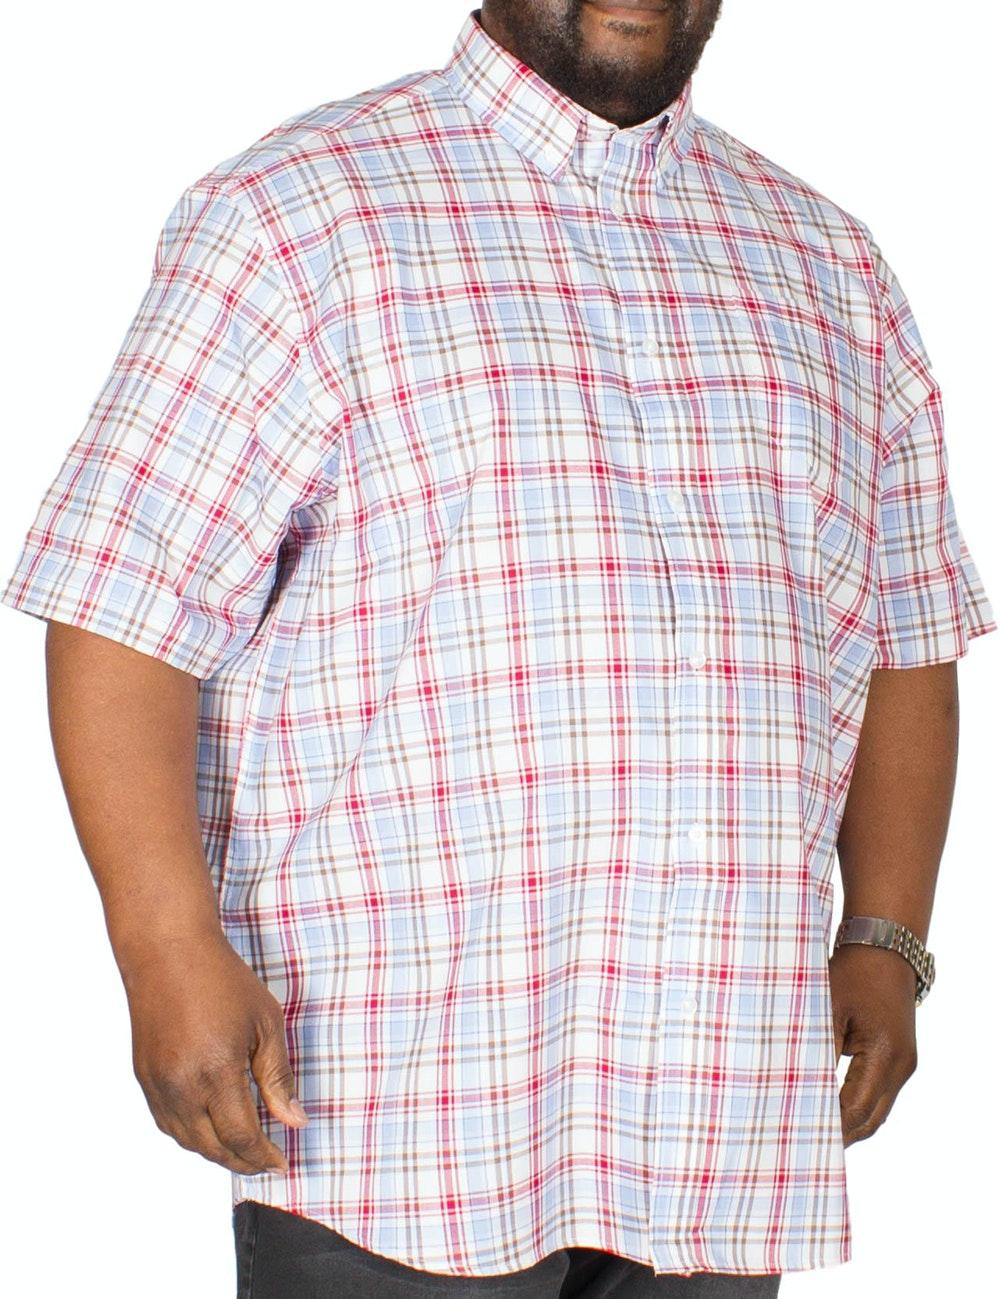 Carabou Check Shirt Red/Brown